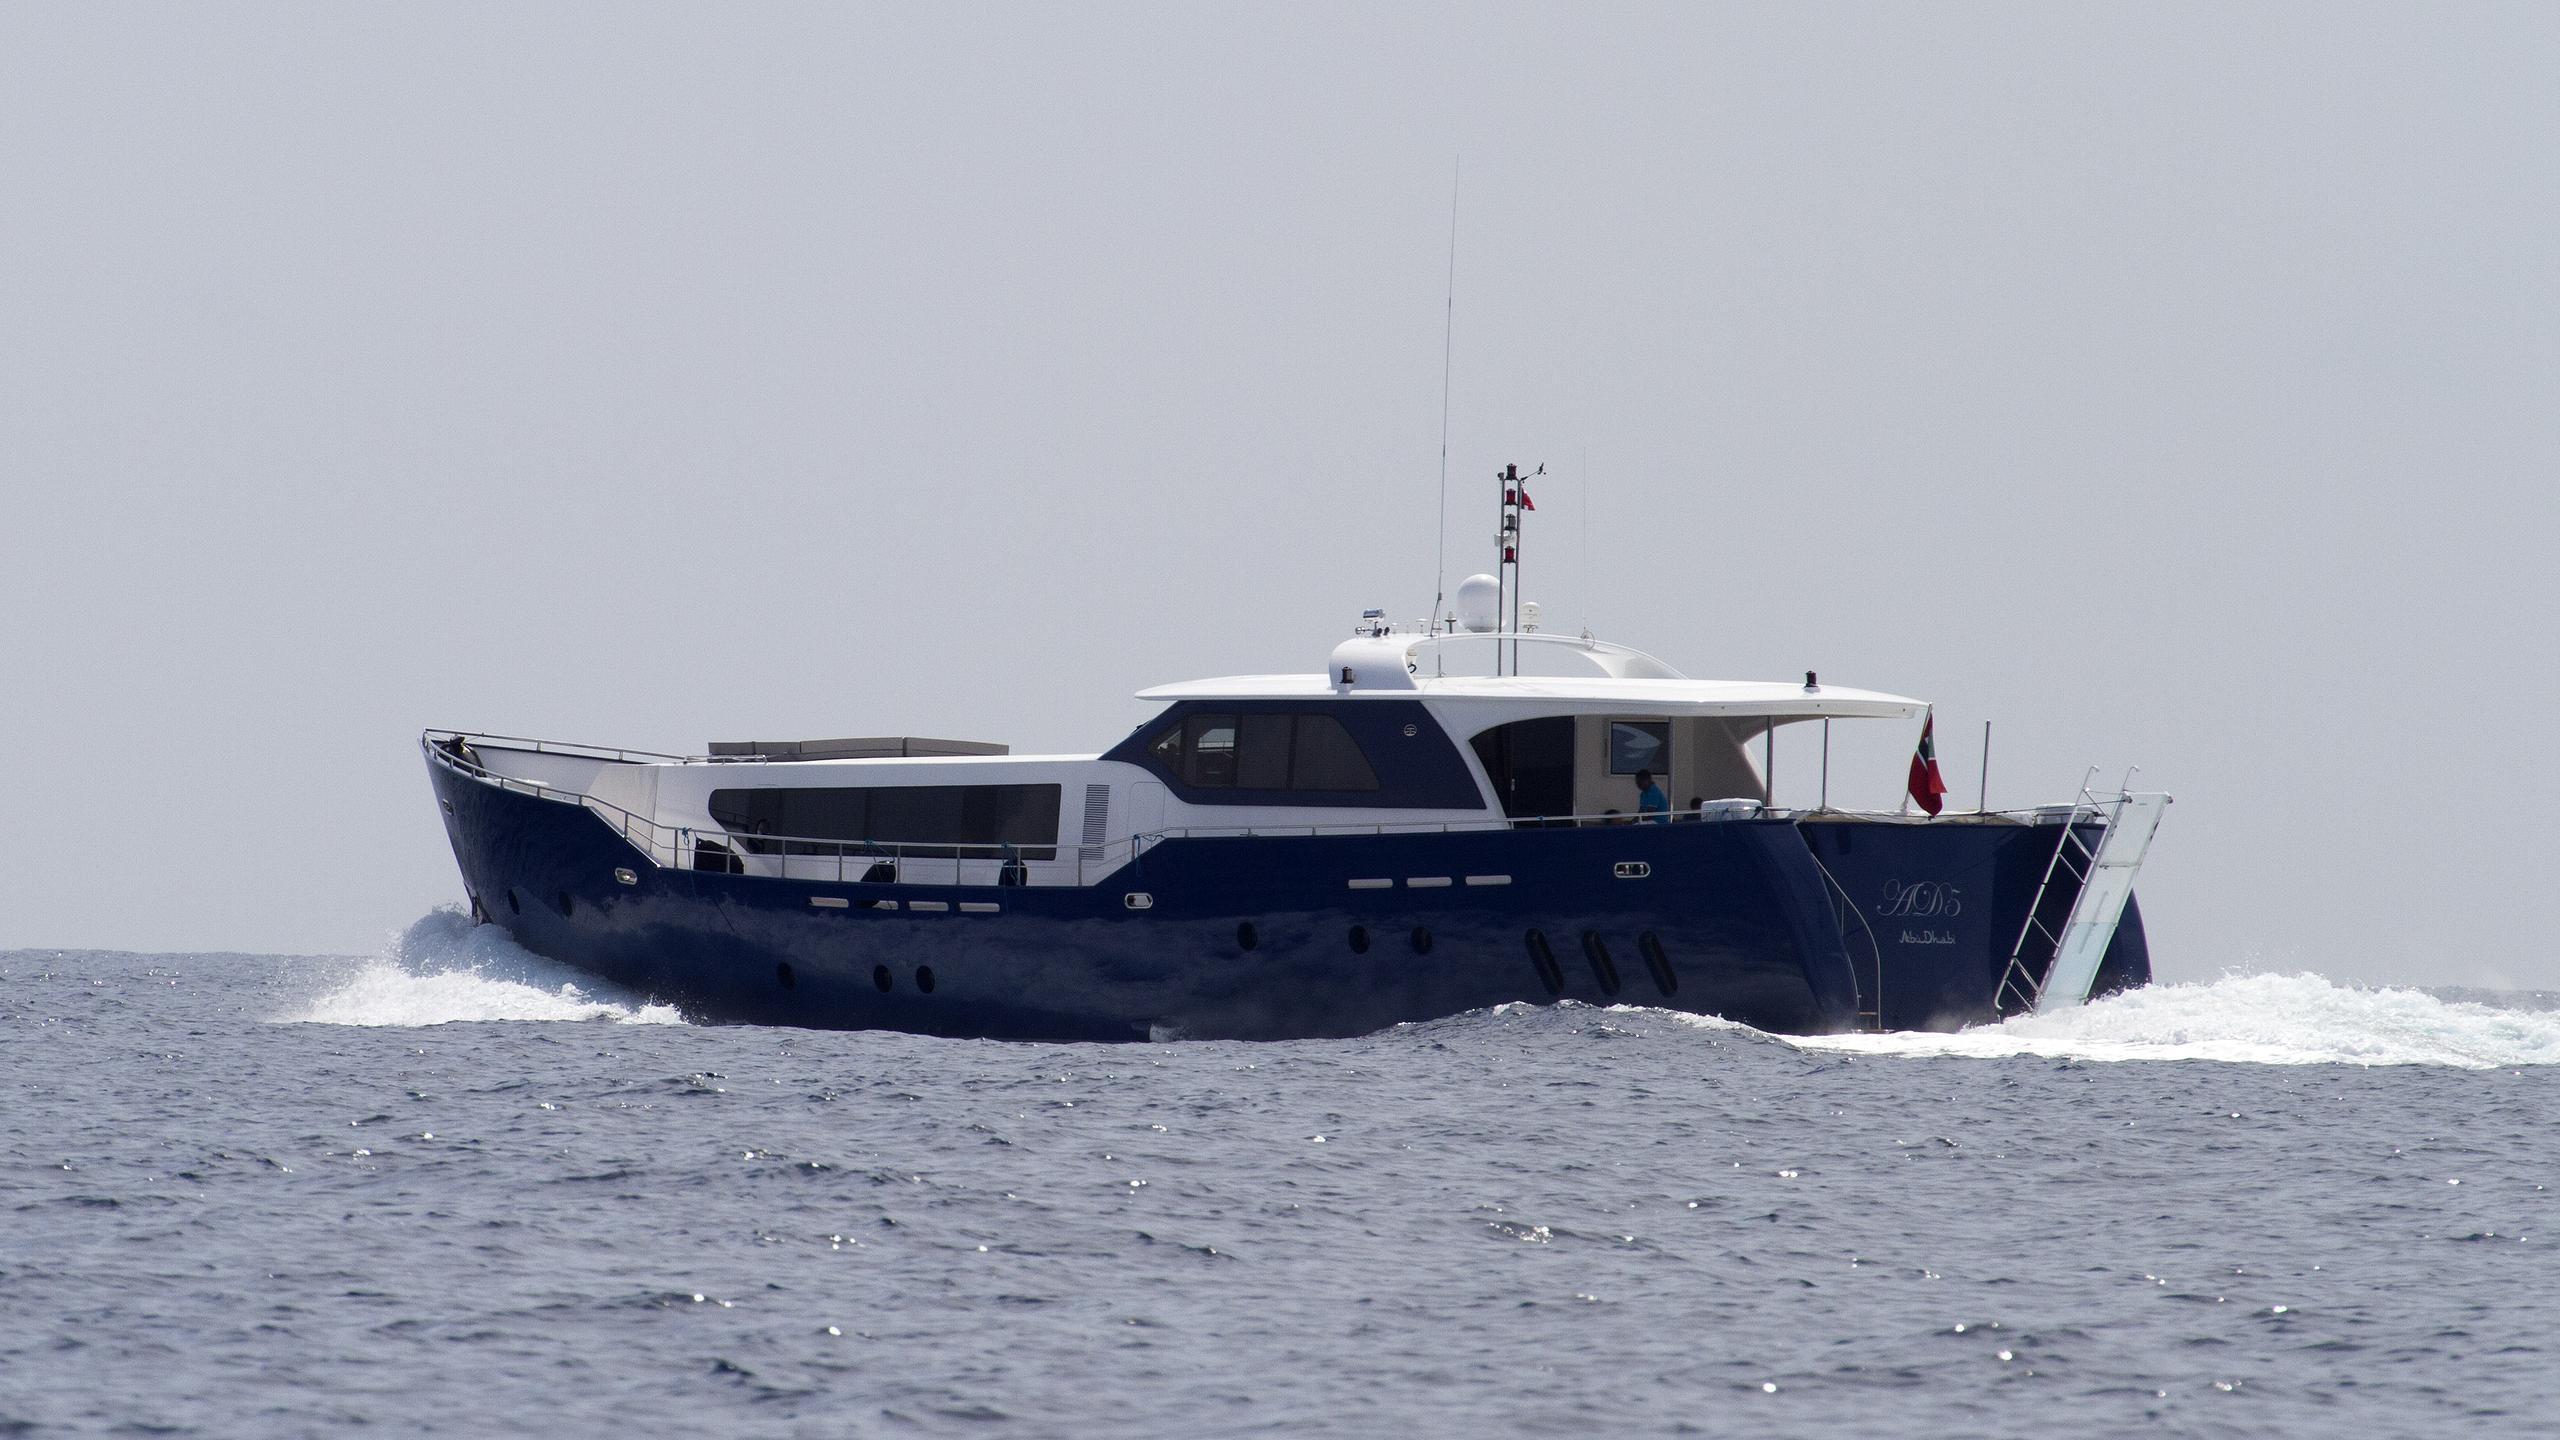 ad5-motoryacht-agantur-32m-2011-running-half-stern